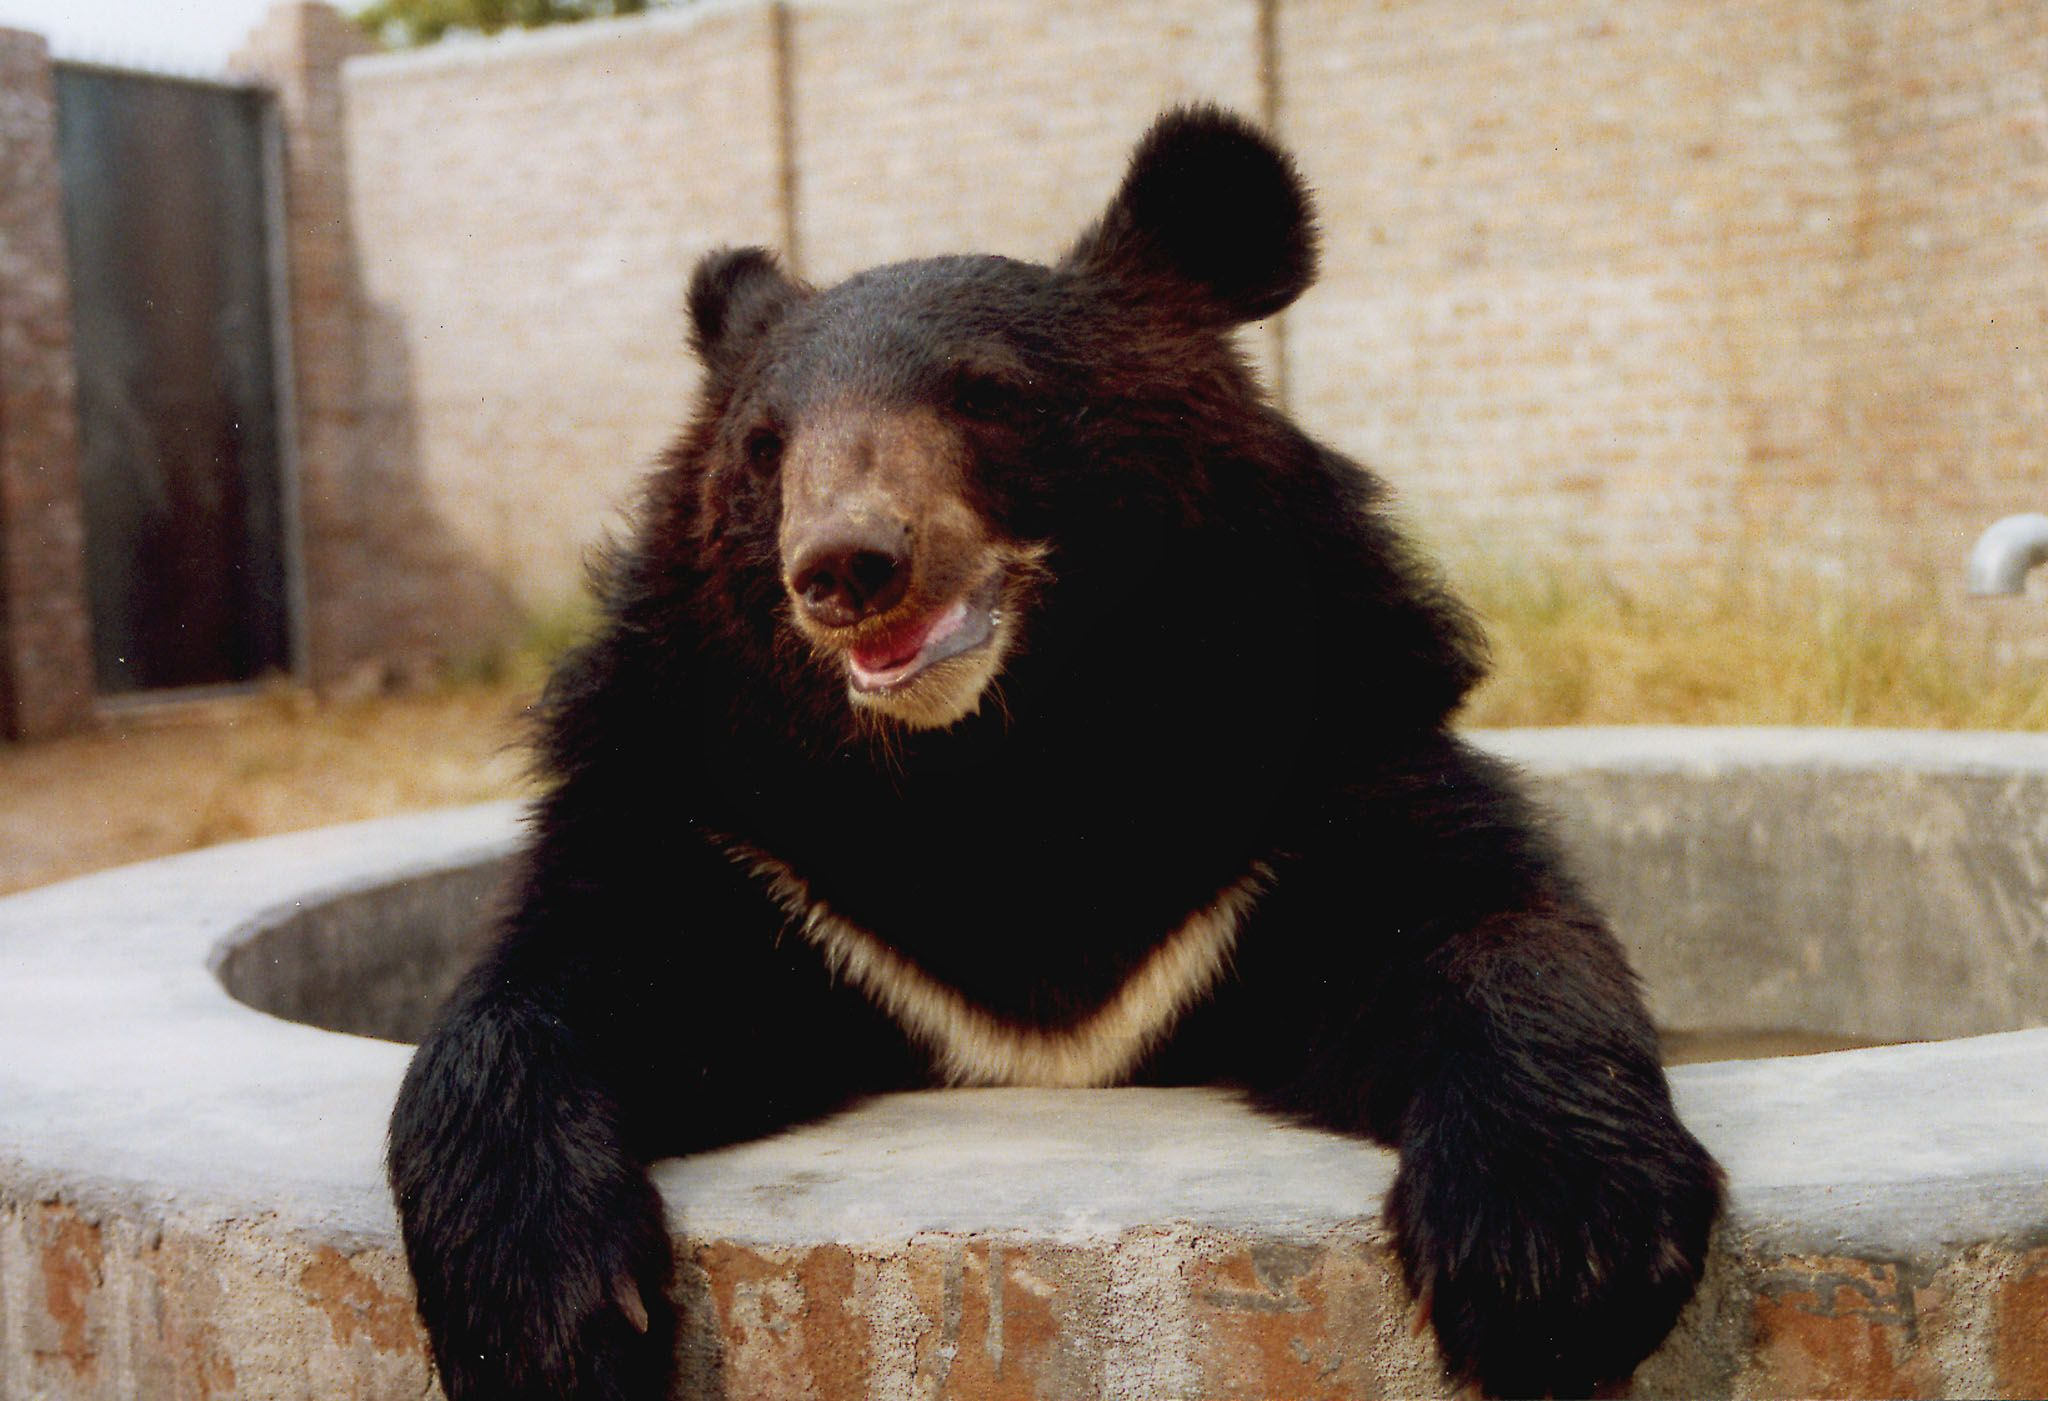 04_24_Bear_Baiting_01